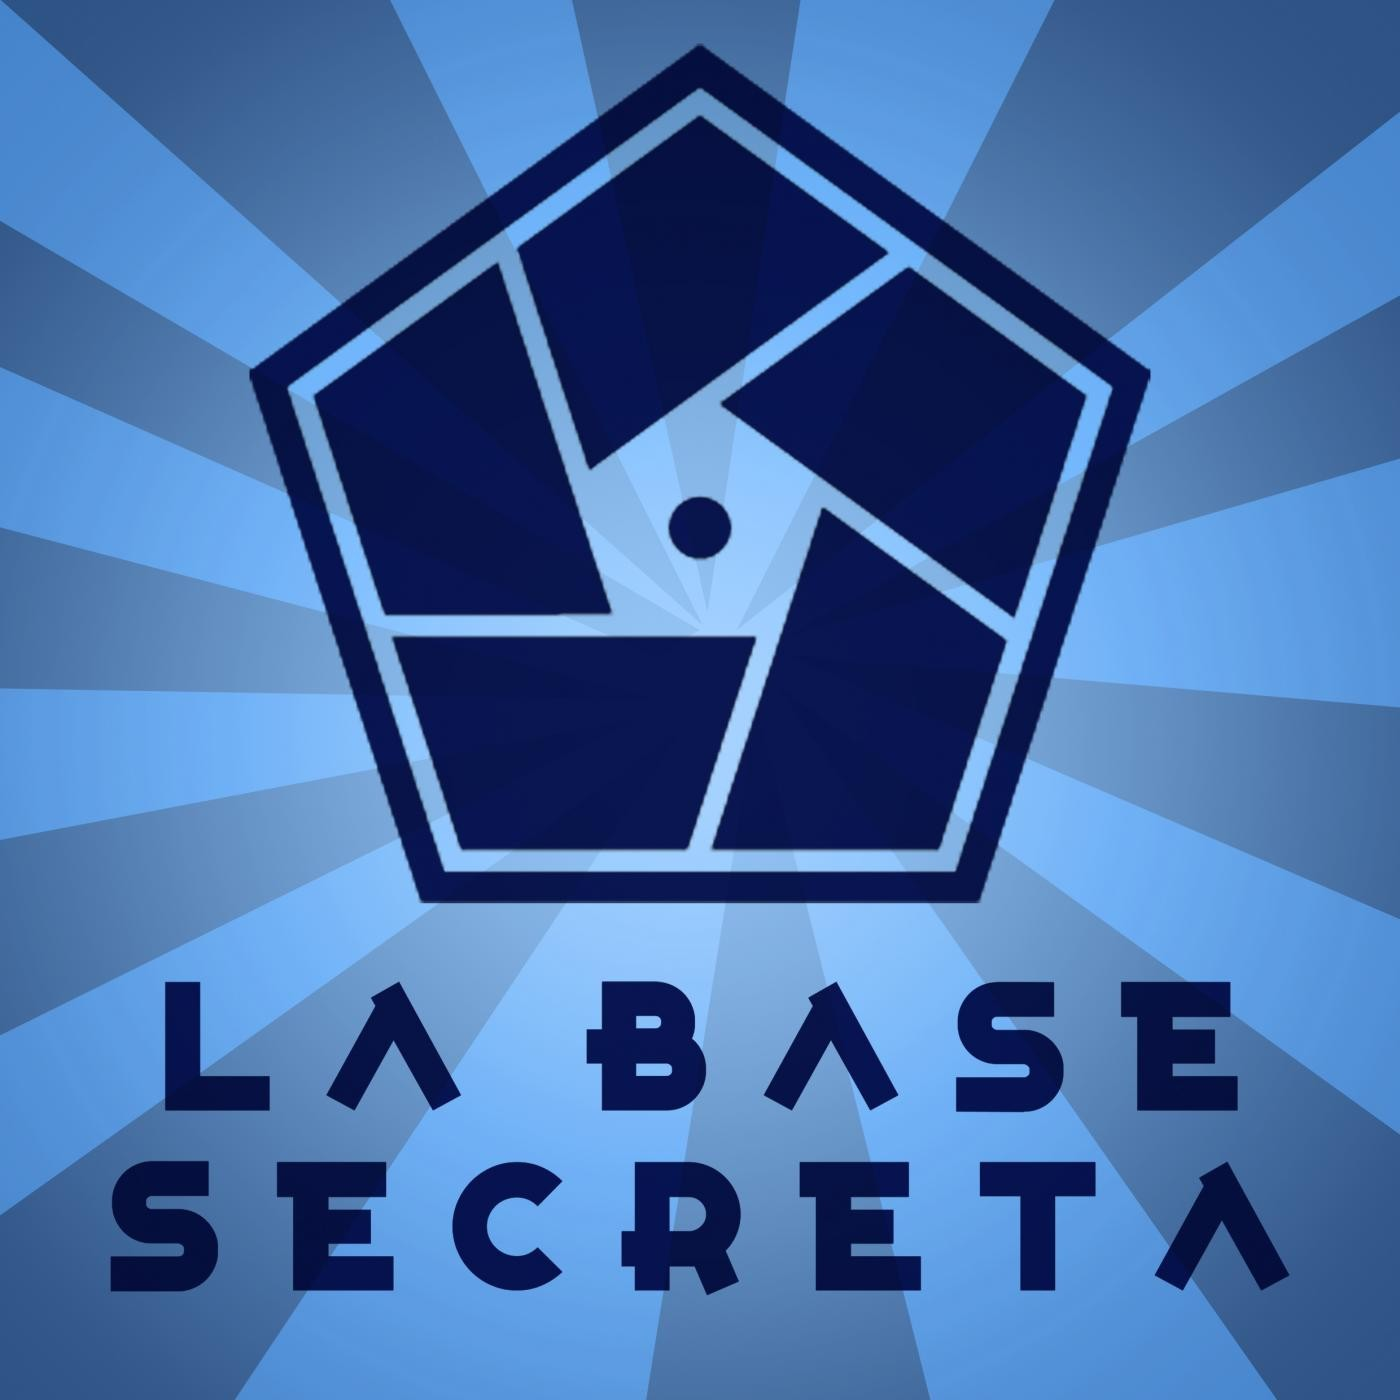 <![CDATA[LA BASE SECRETA ]]>